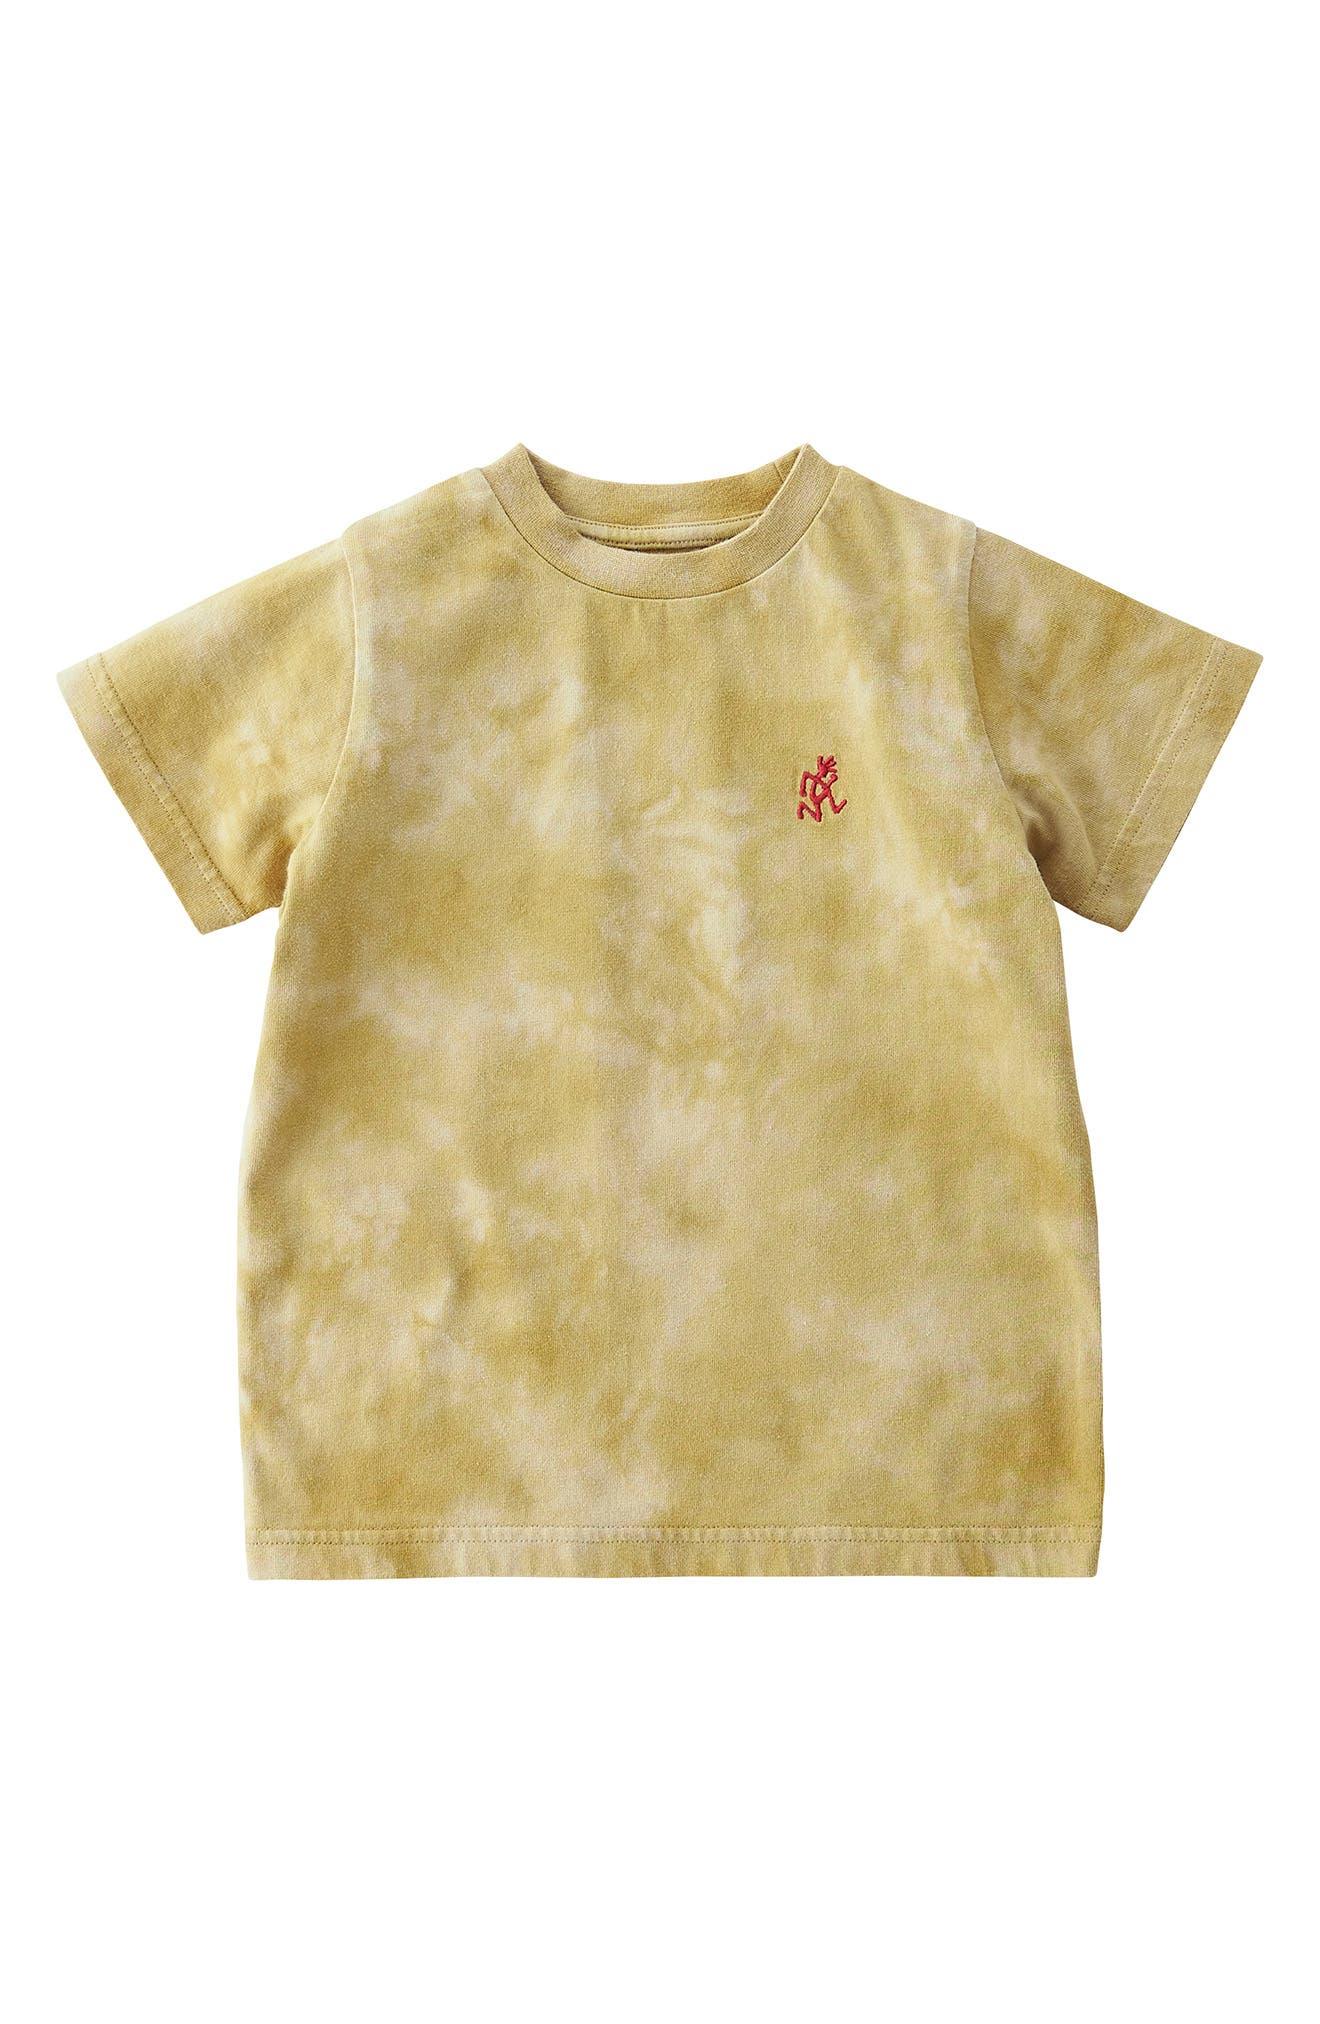 Kids' Running Man Embroidered Tie Dye T-Shirt